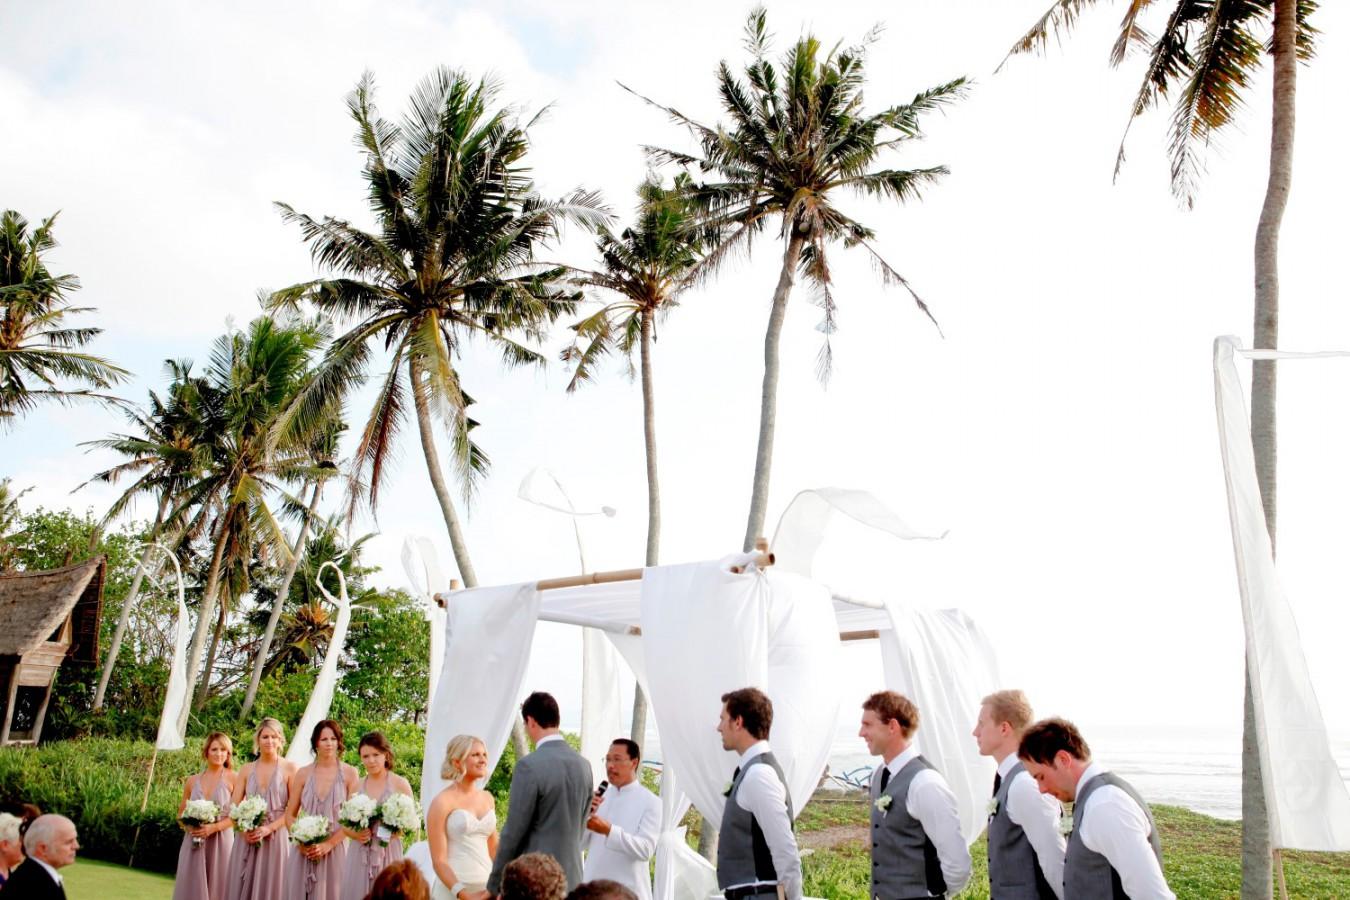 2011.10.16, Megann and Daniel, Ombak Luwung, MJY - Bali Wedding Paradise (15)